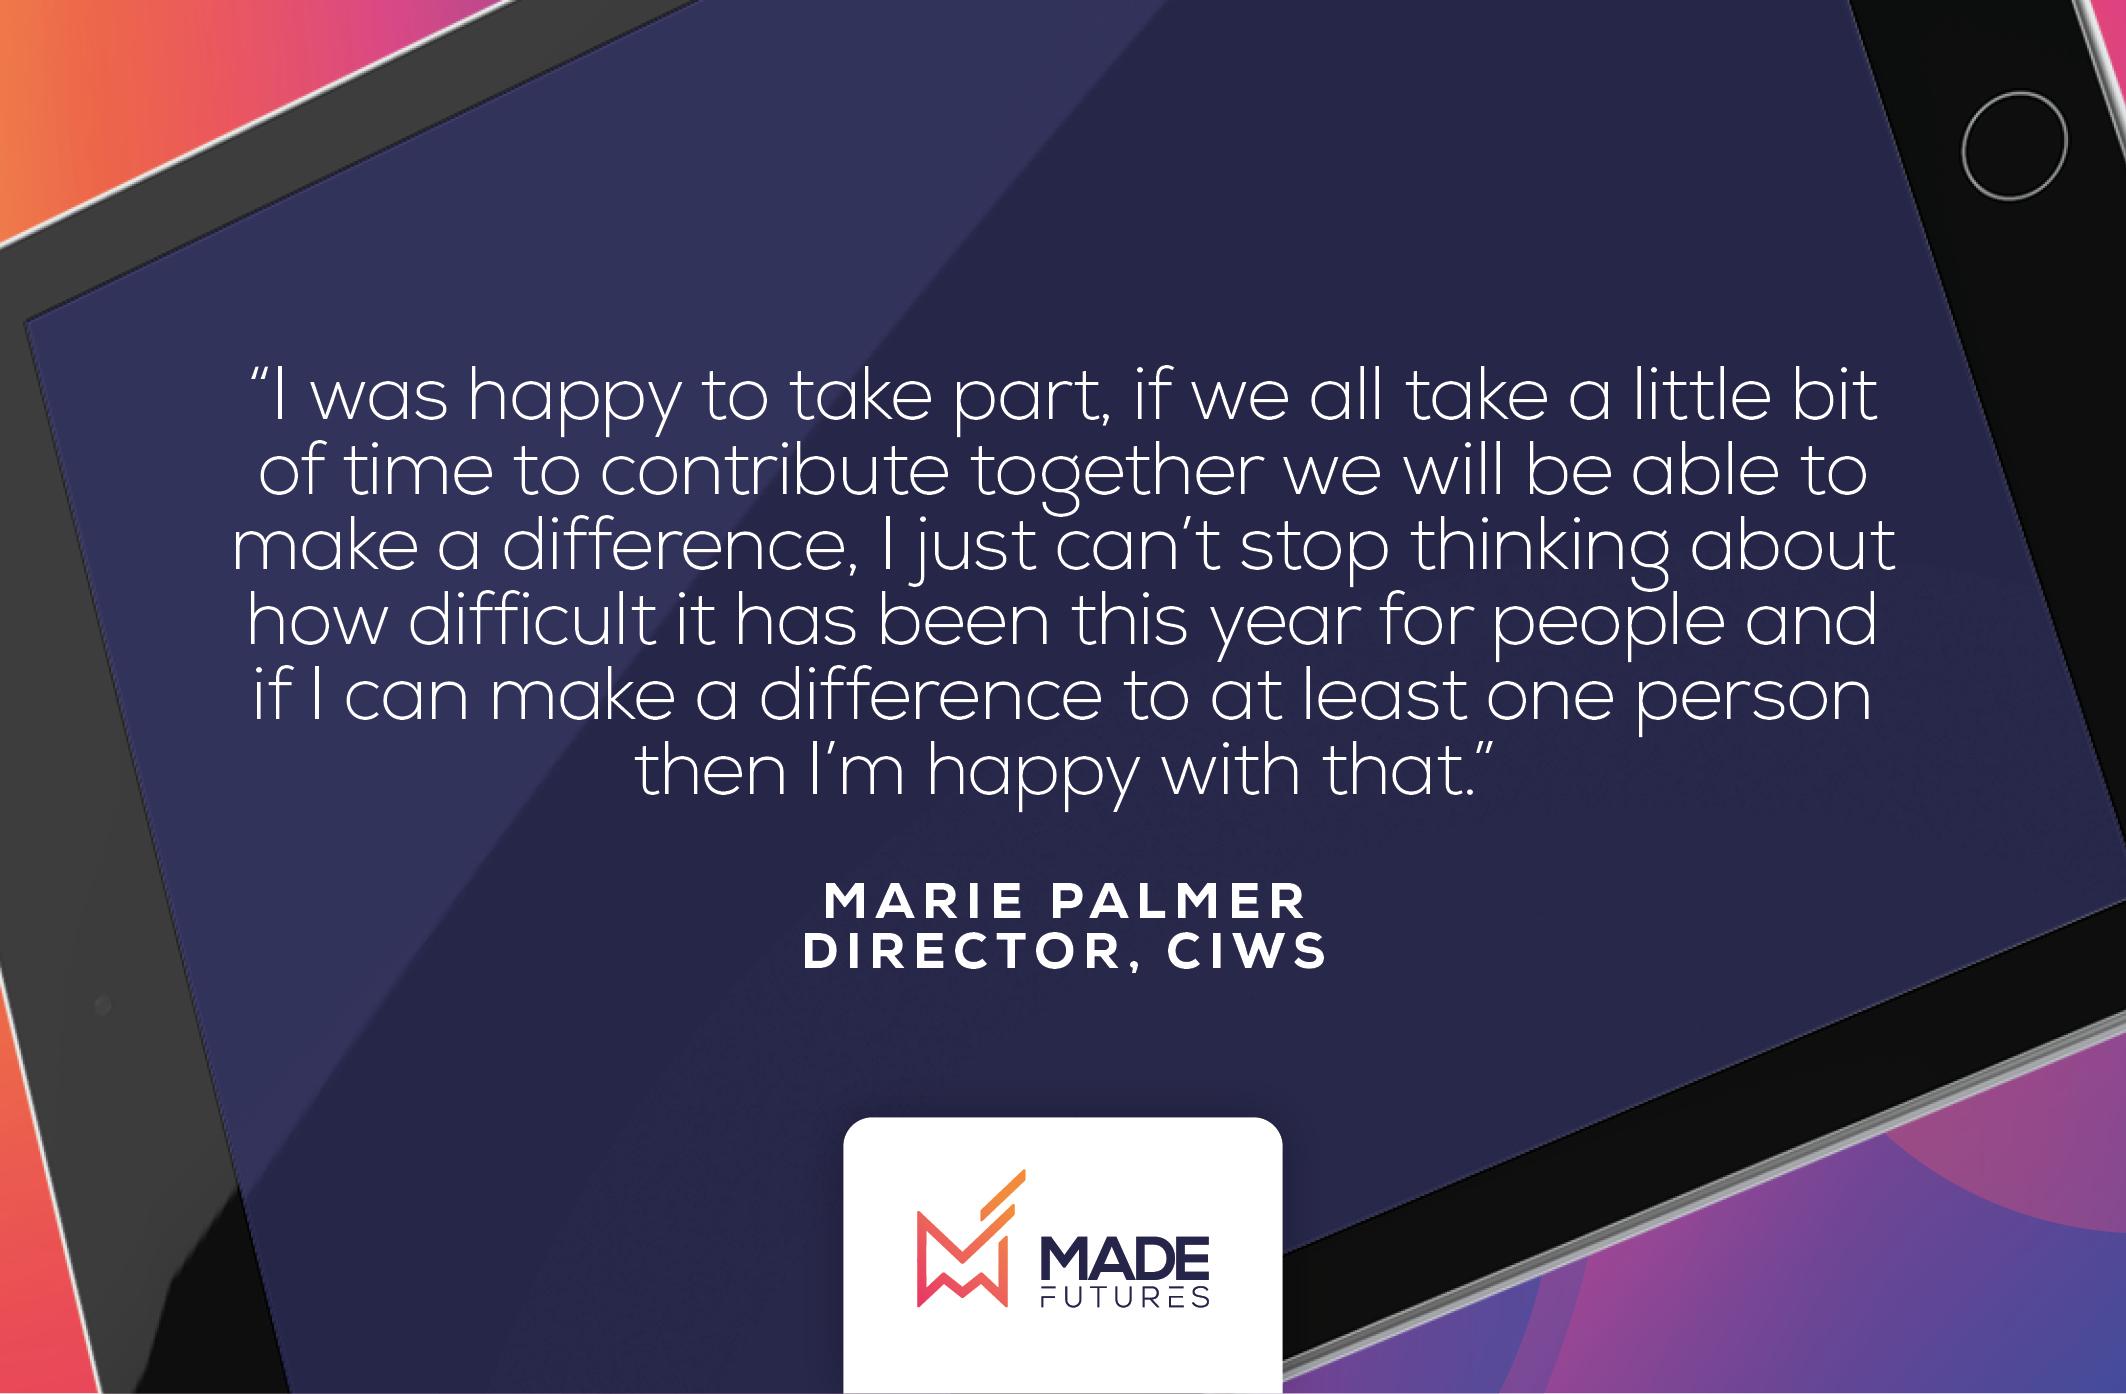 Testimonial by Marie Palmer, Director at CIWS